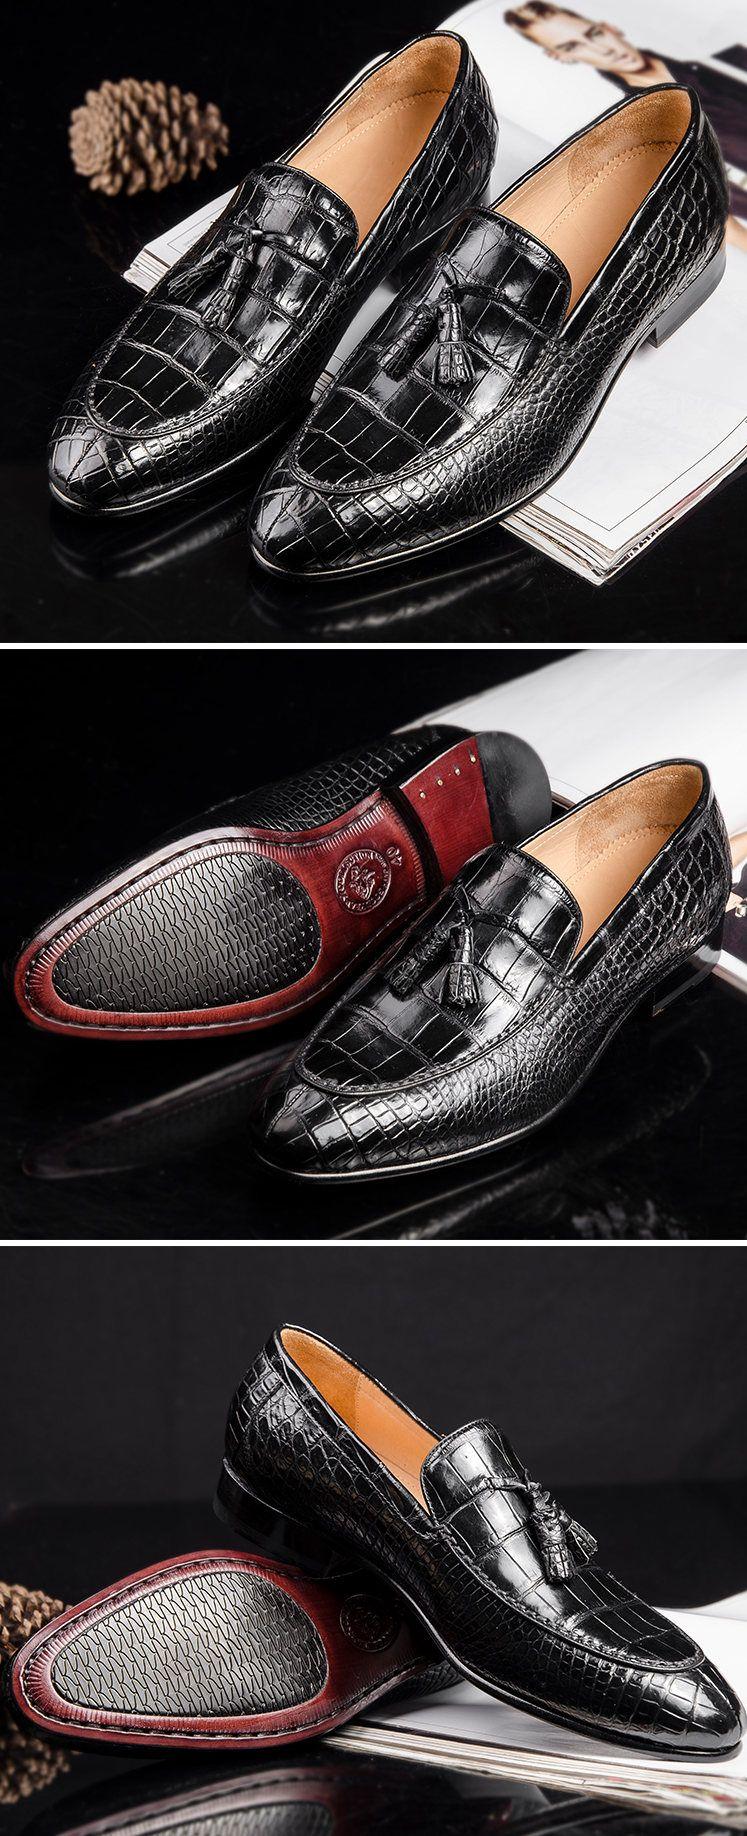 48aa956b34 Genuine Alligator Skin Slip-on Loafer Dress Shoes for Men in 2019 ...